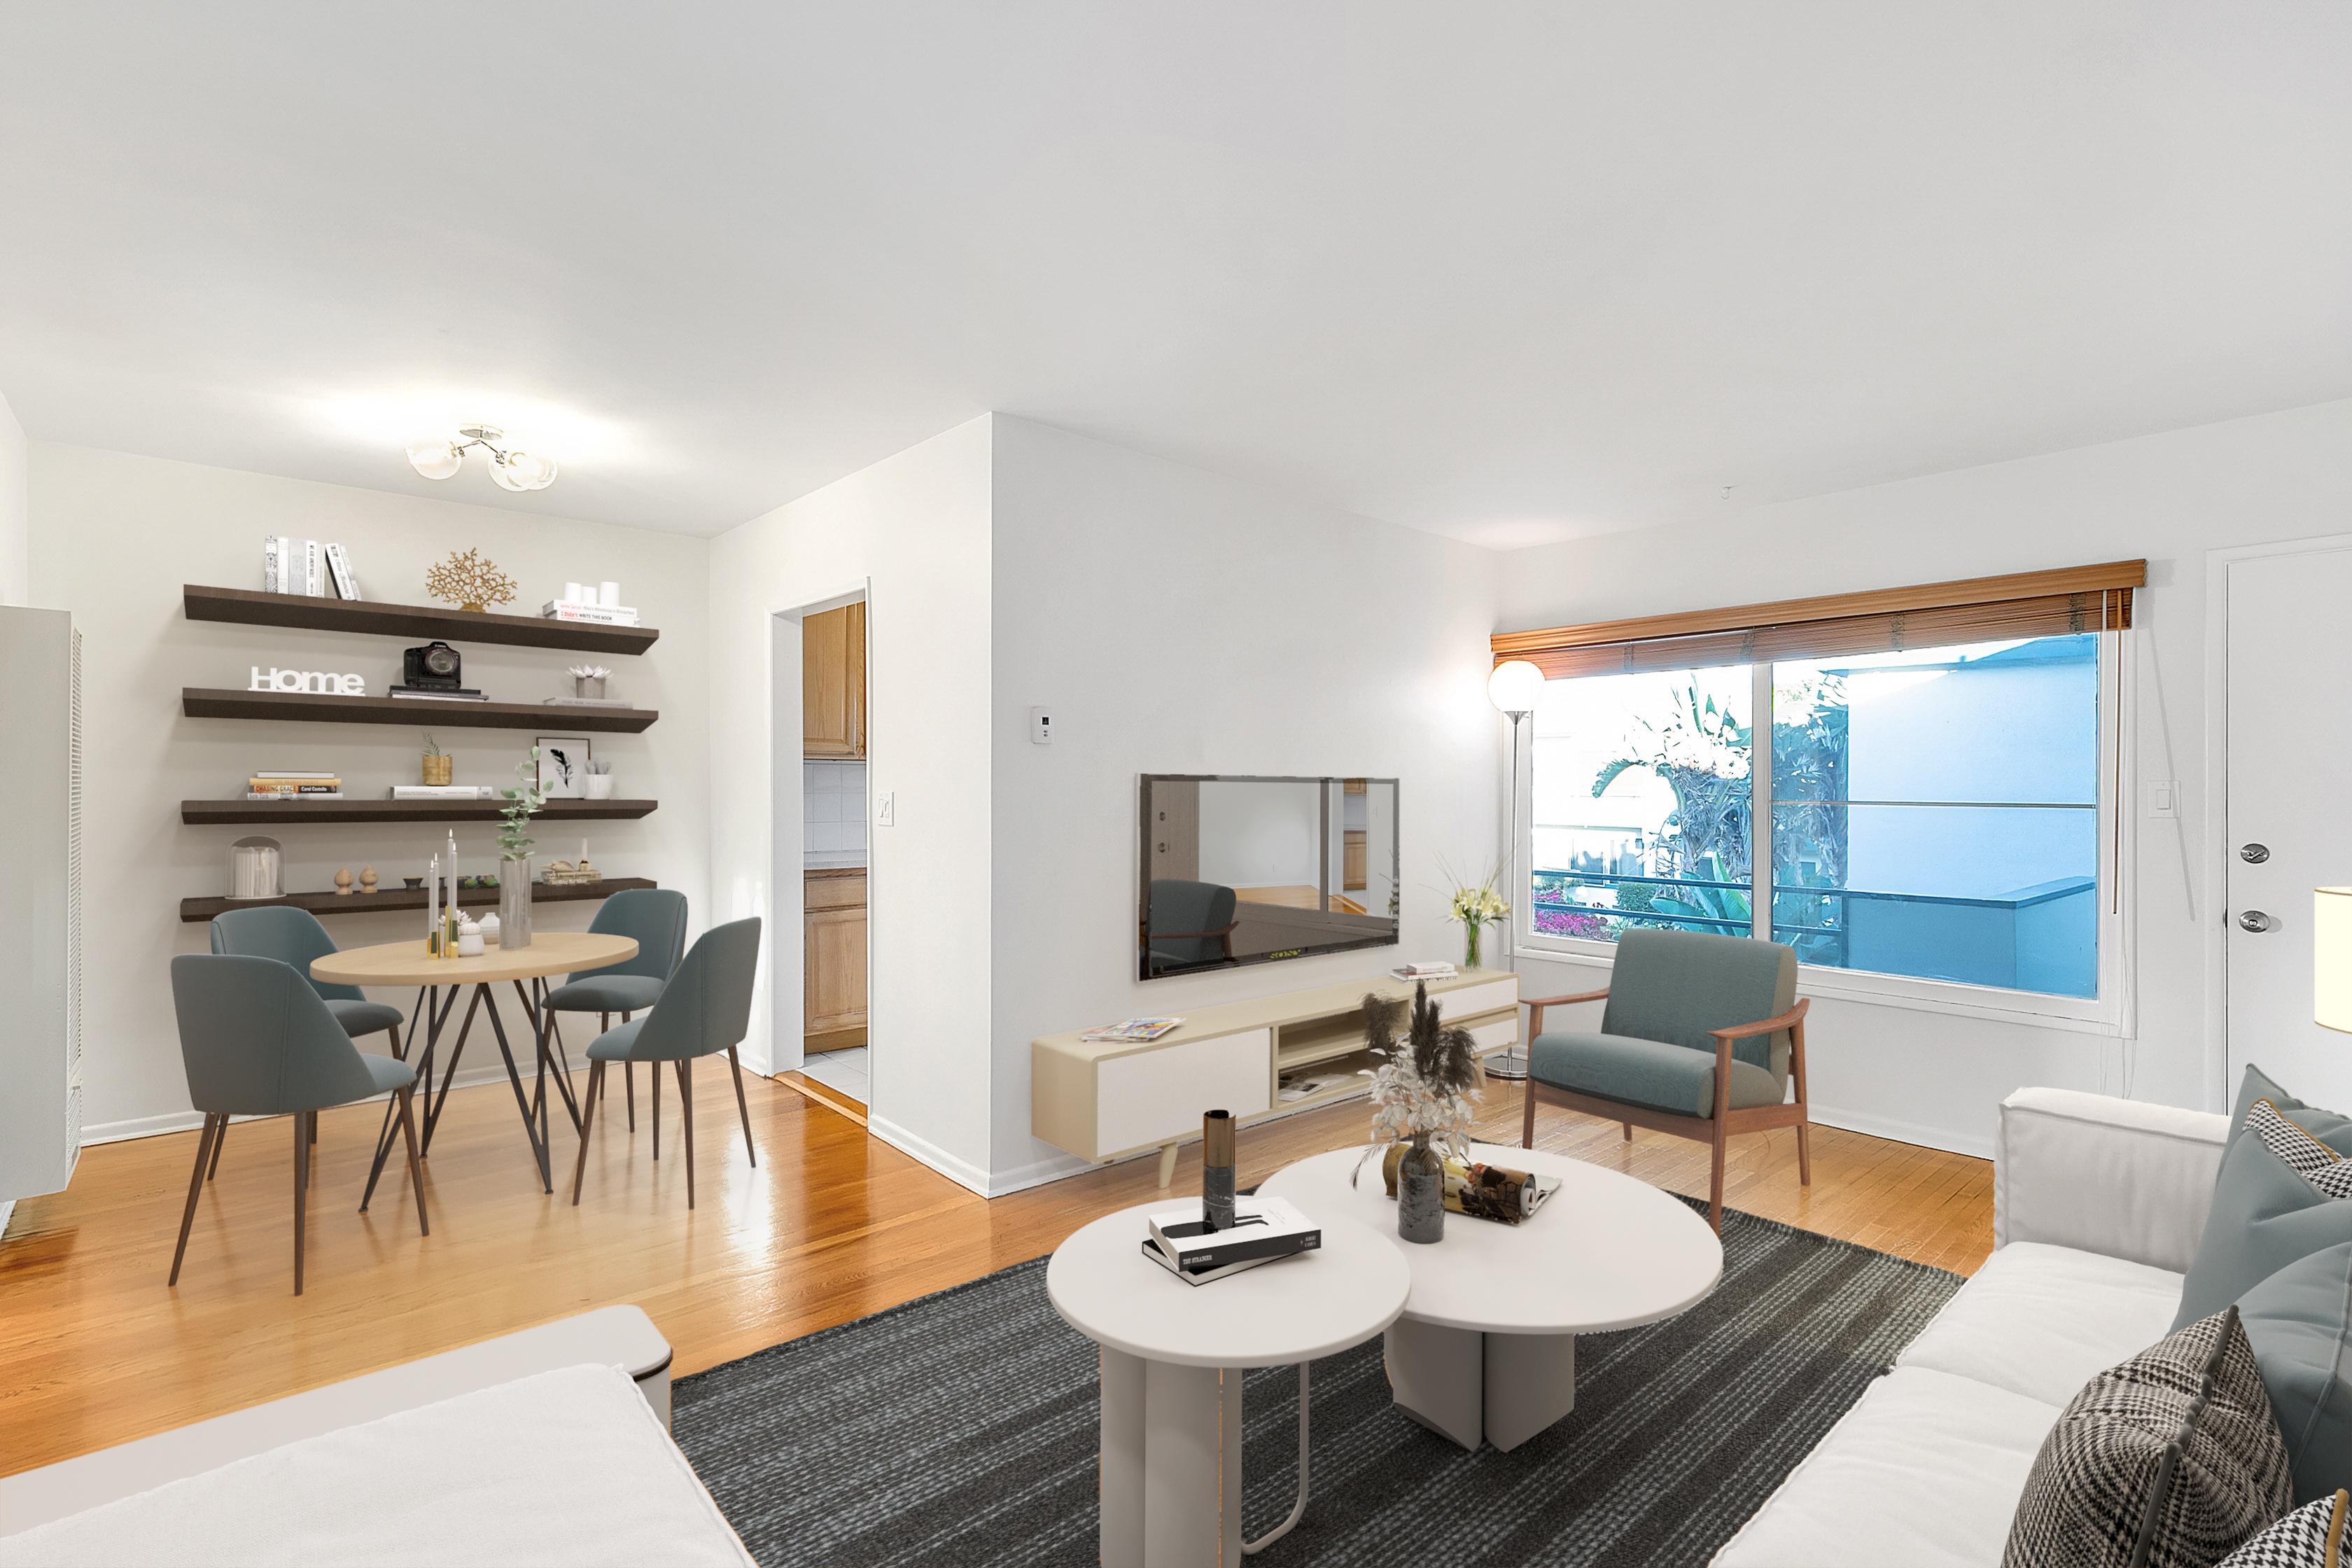 Clean & Pristine Upper 1BD Condo in Santa Monica with Parking & Communal Courtyard Space!